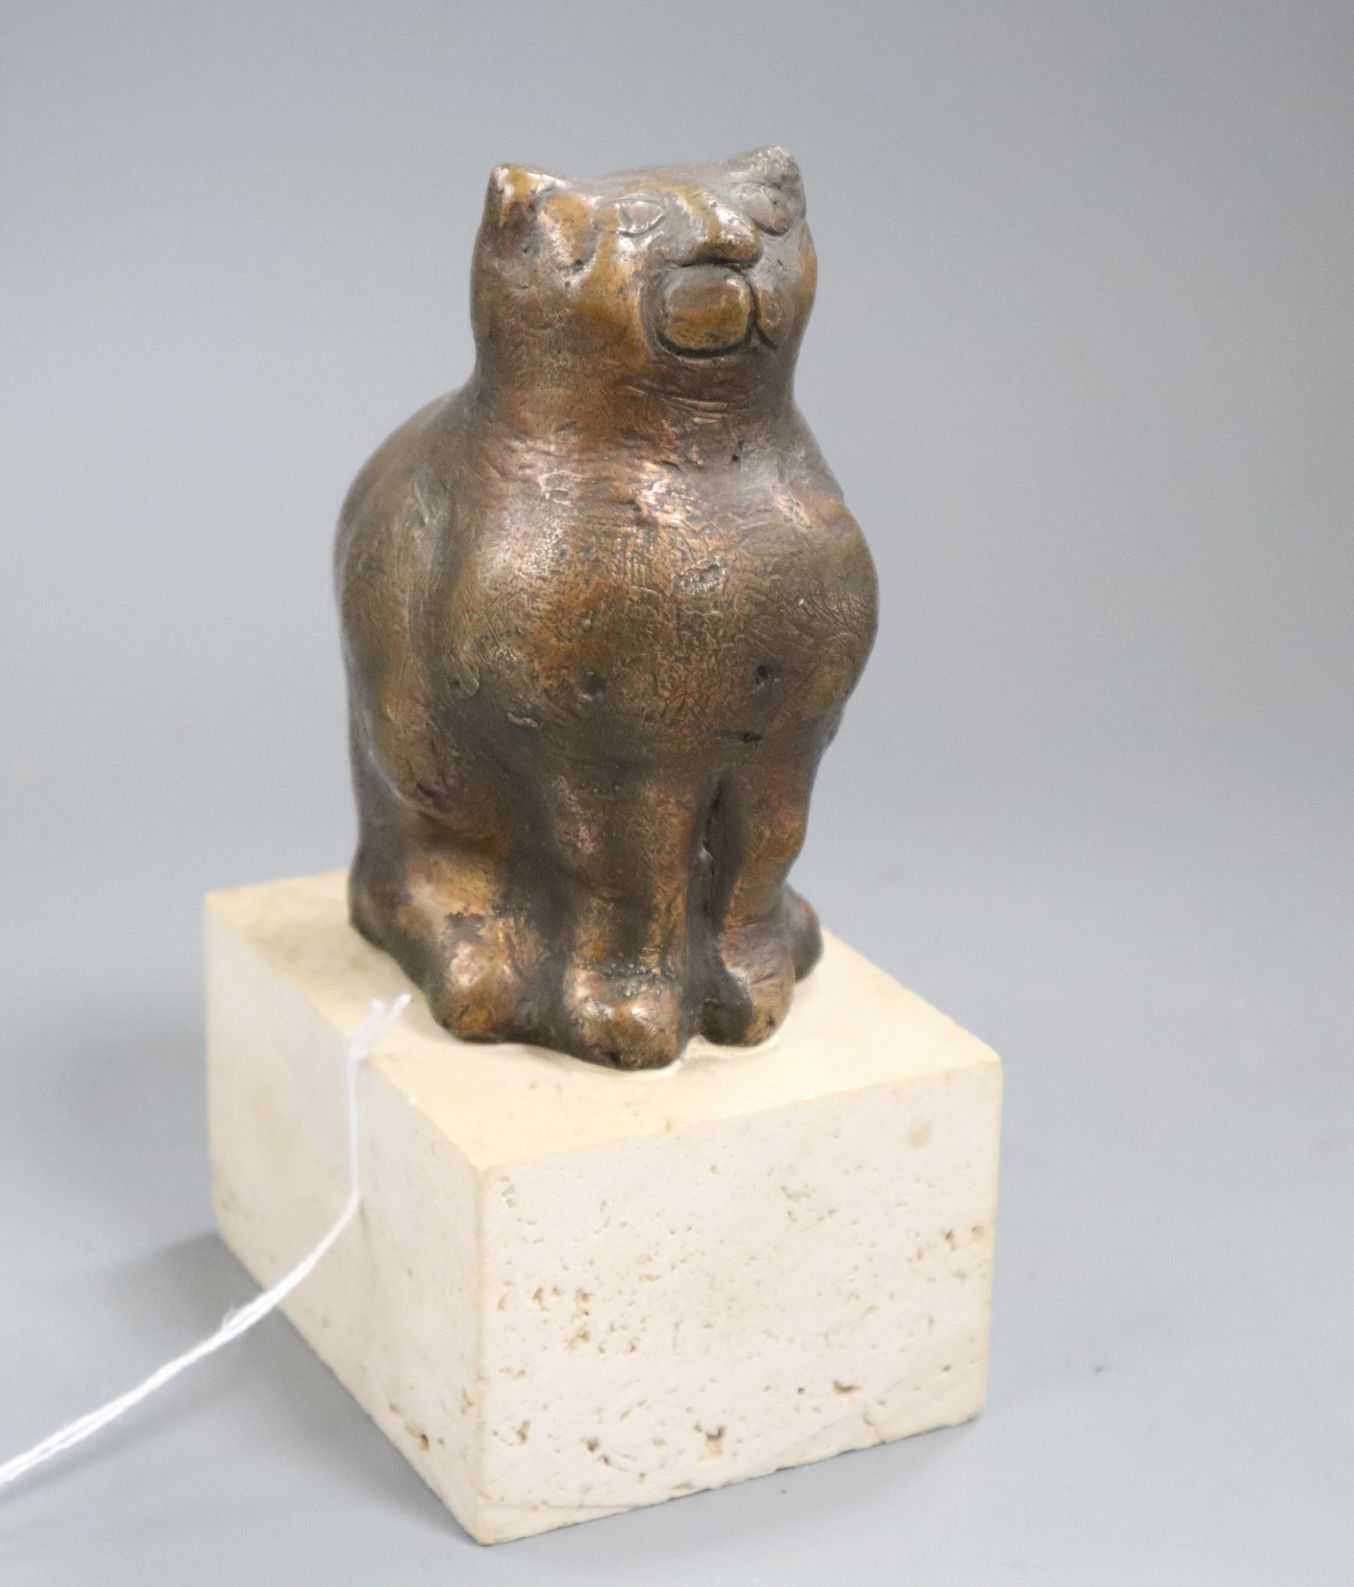 Lot 93 - Oreste Dequel. A bronze of a cat, signed, 3/6 height 16cm